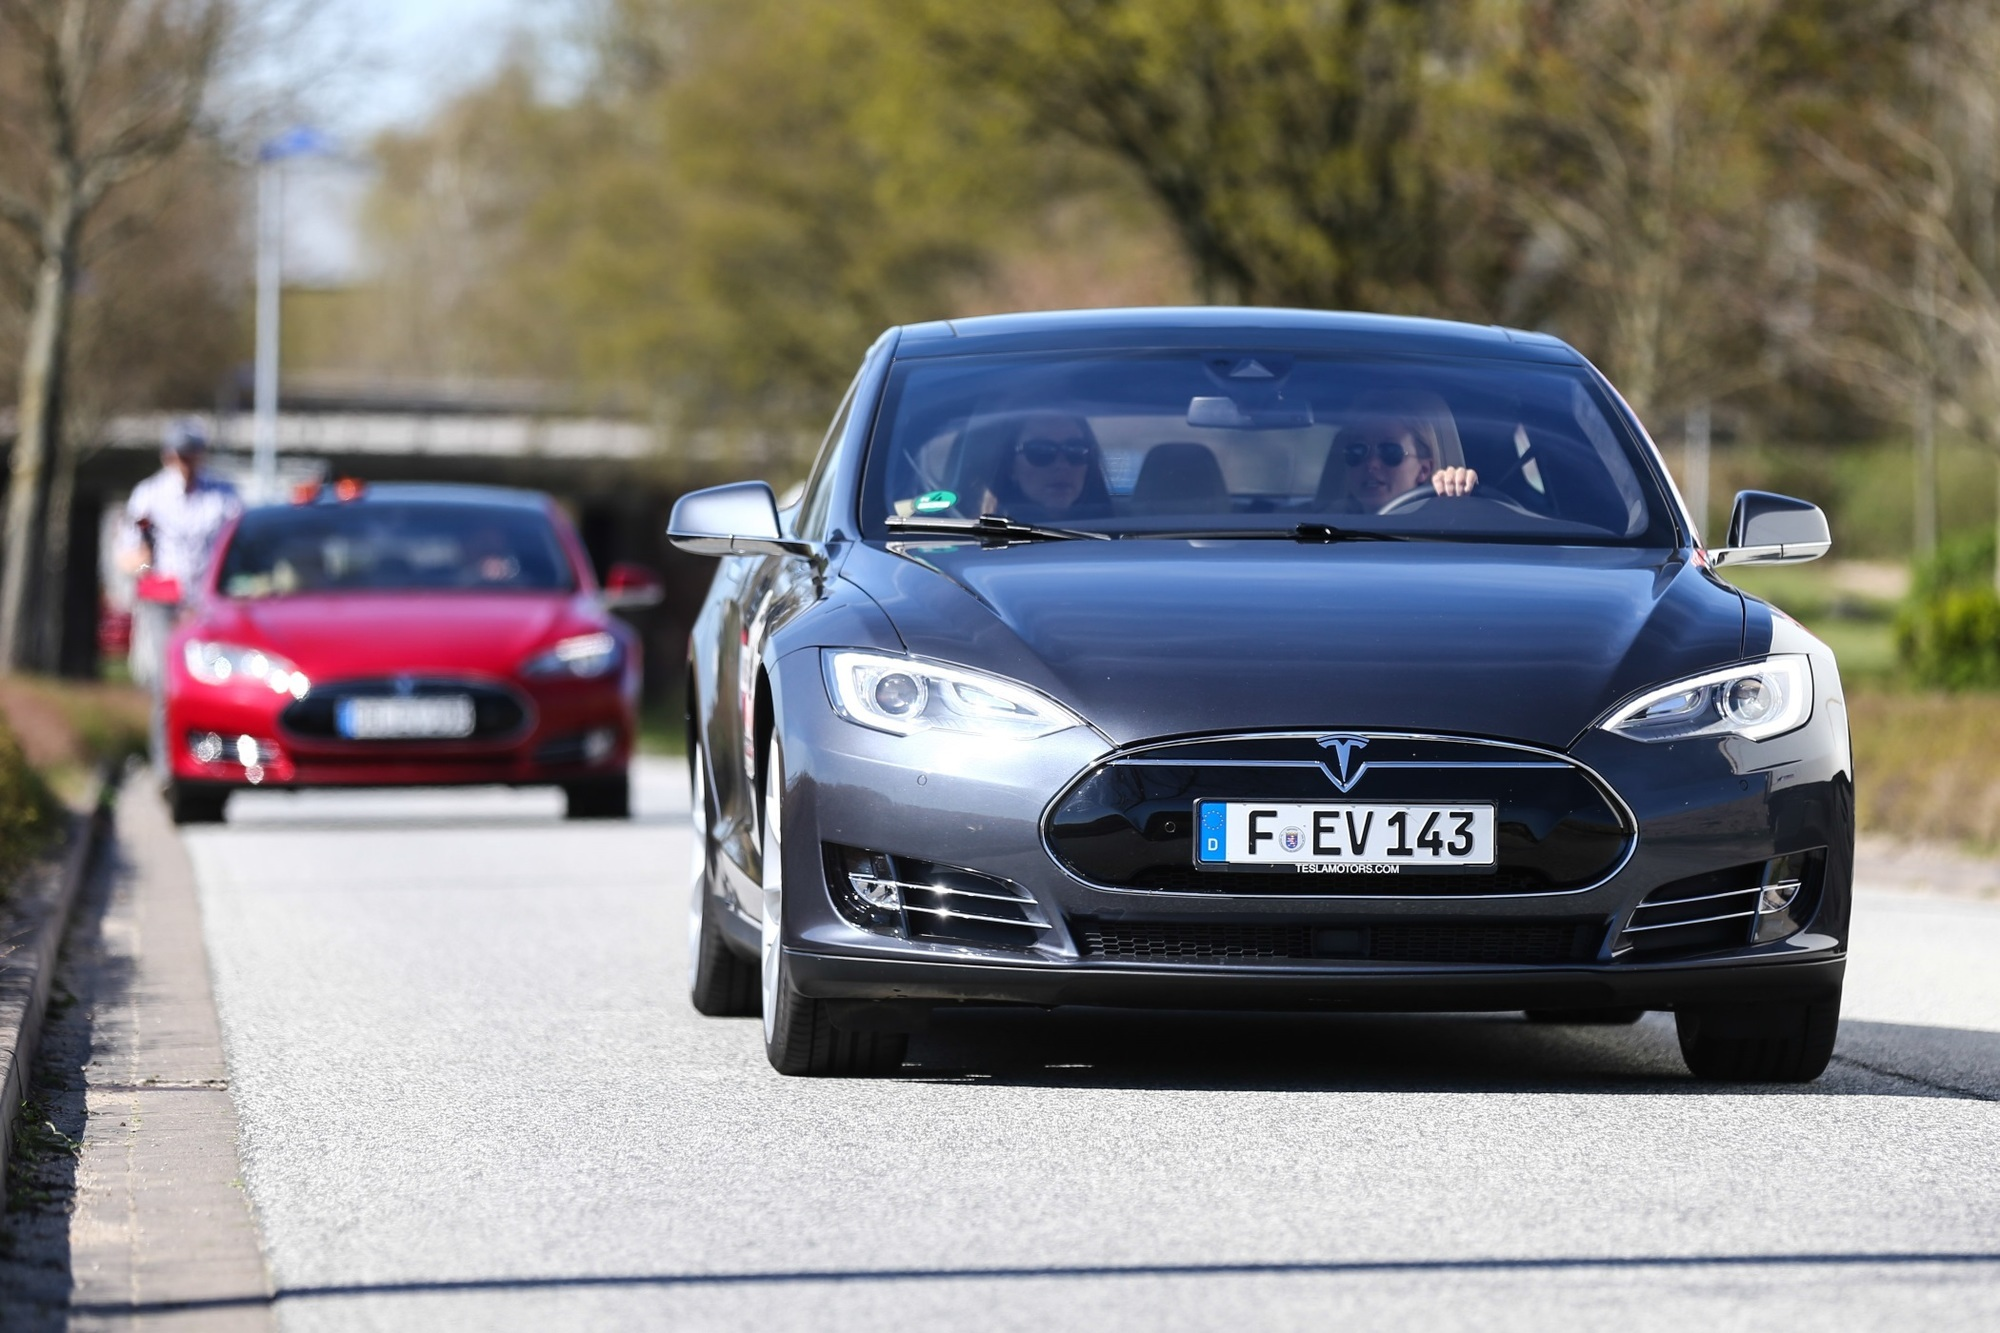 Elektrischer Audi-Crossover kommt 2018 - Besser als Tesla